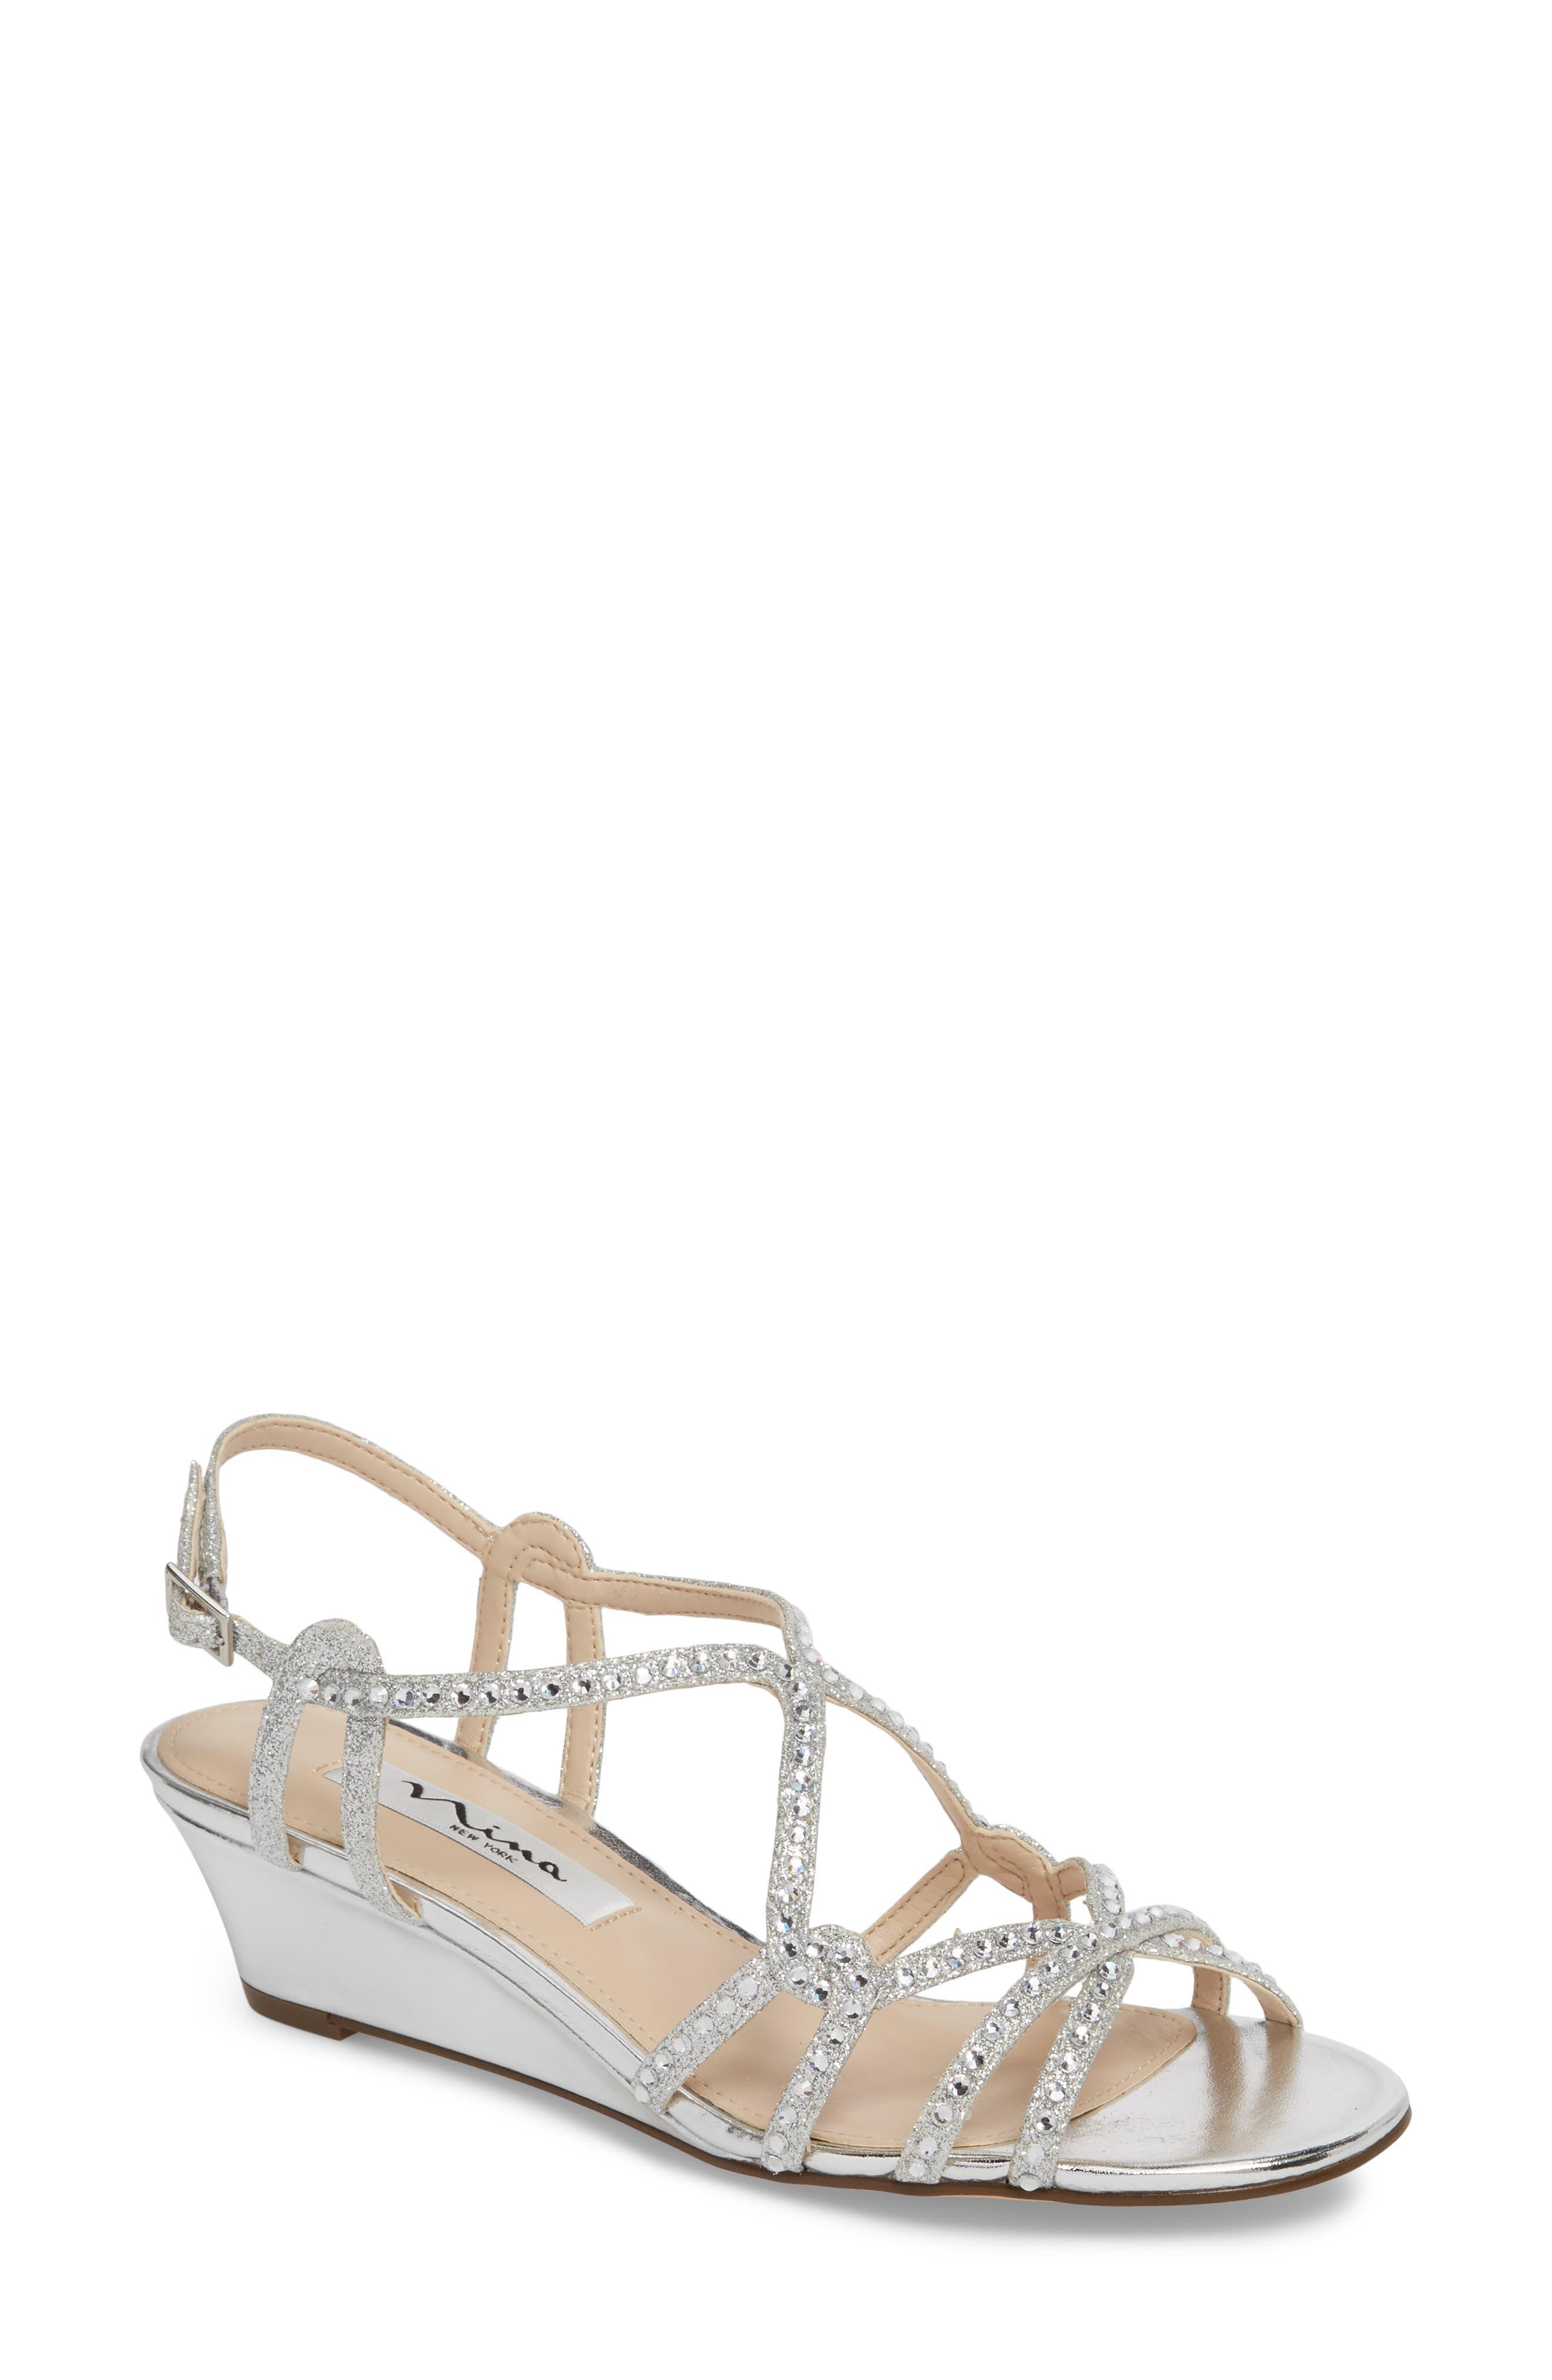 Finola Sandal,                             Main thumbnail 1, color,                             Silver Glitter Fabric